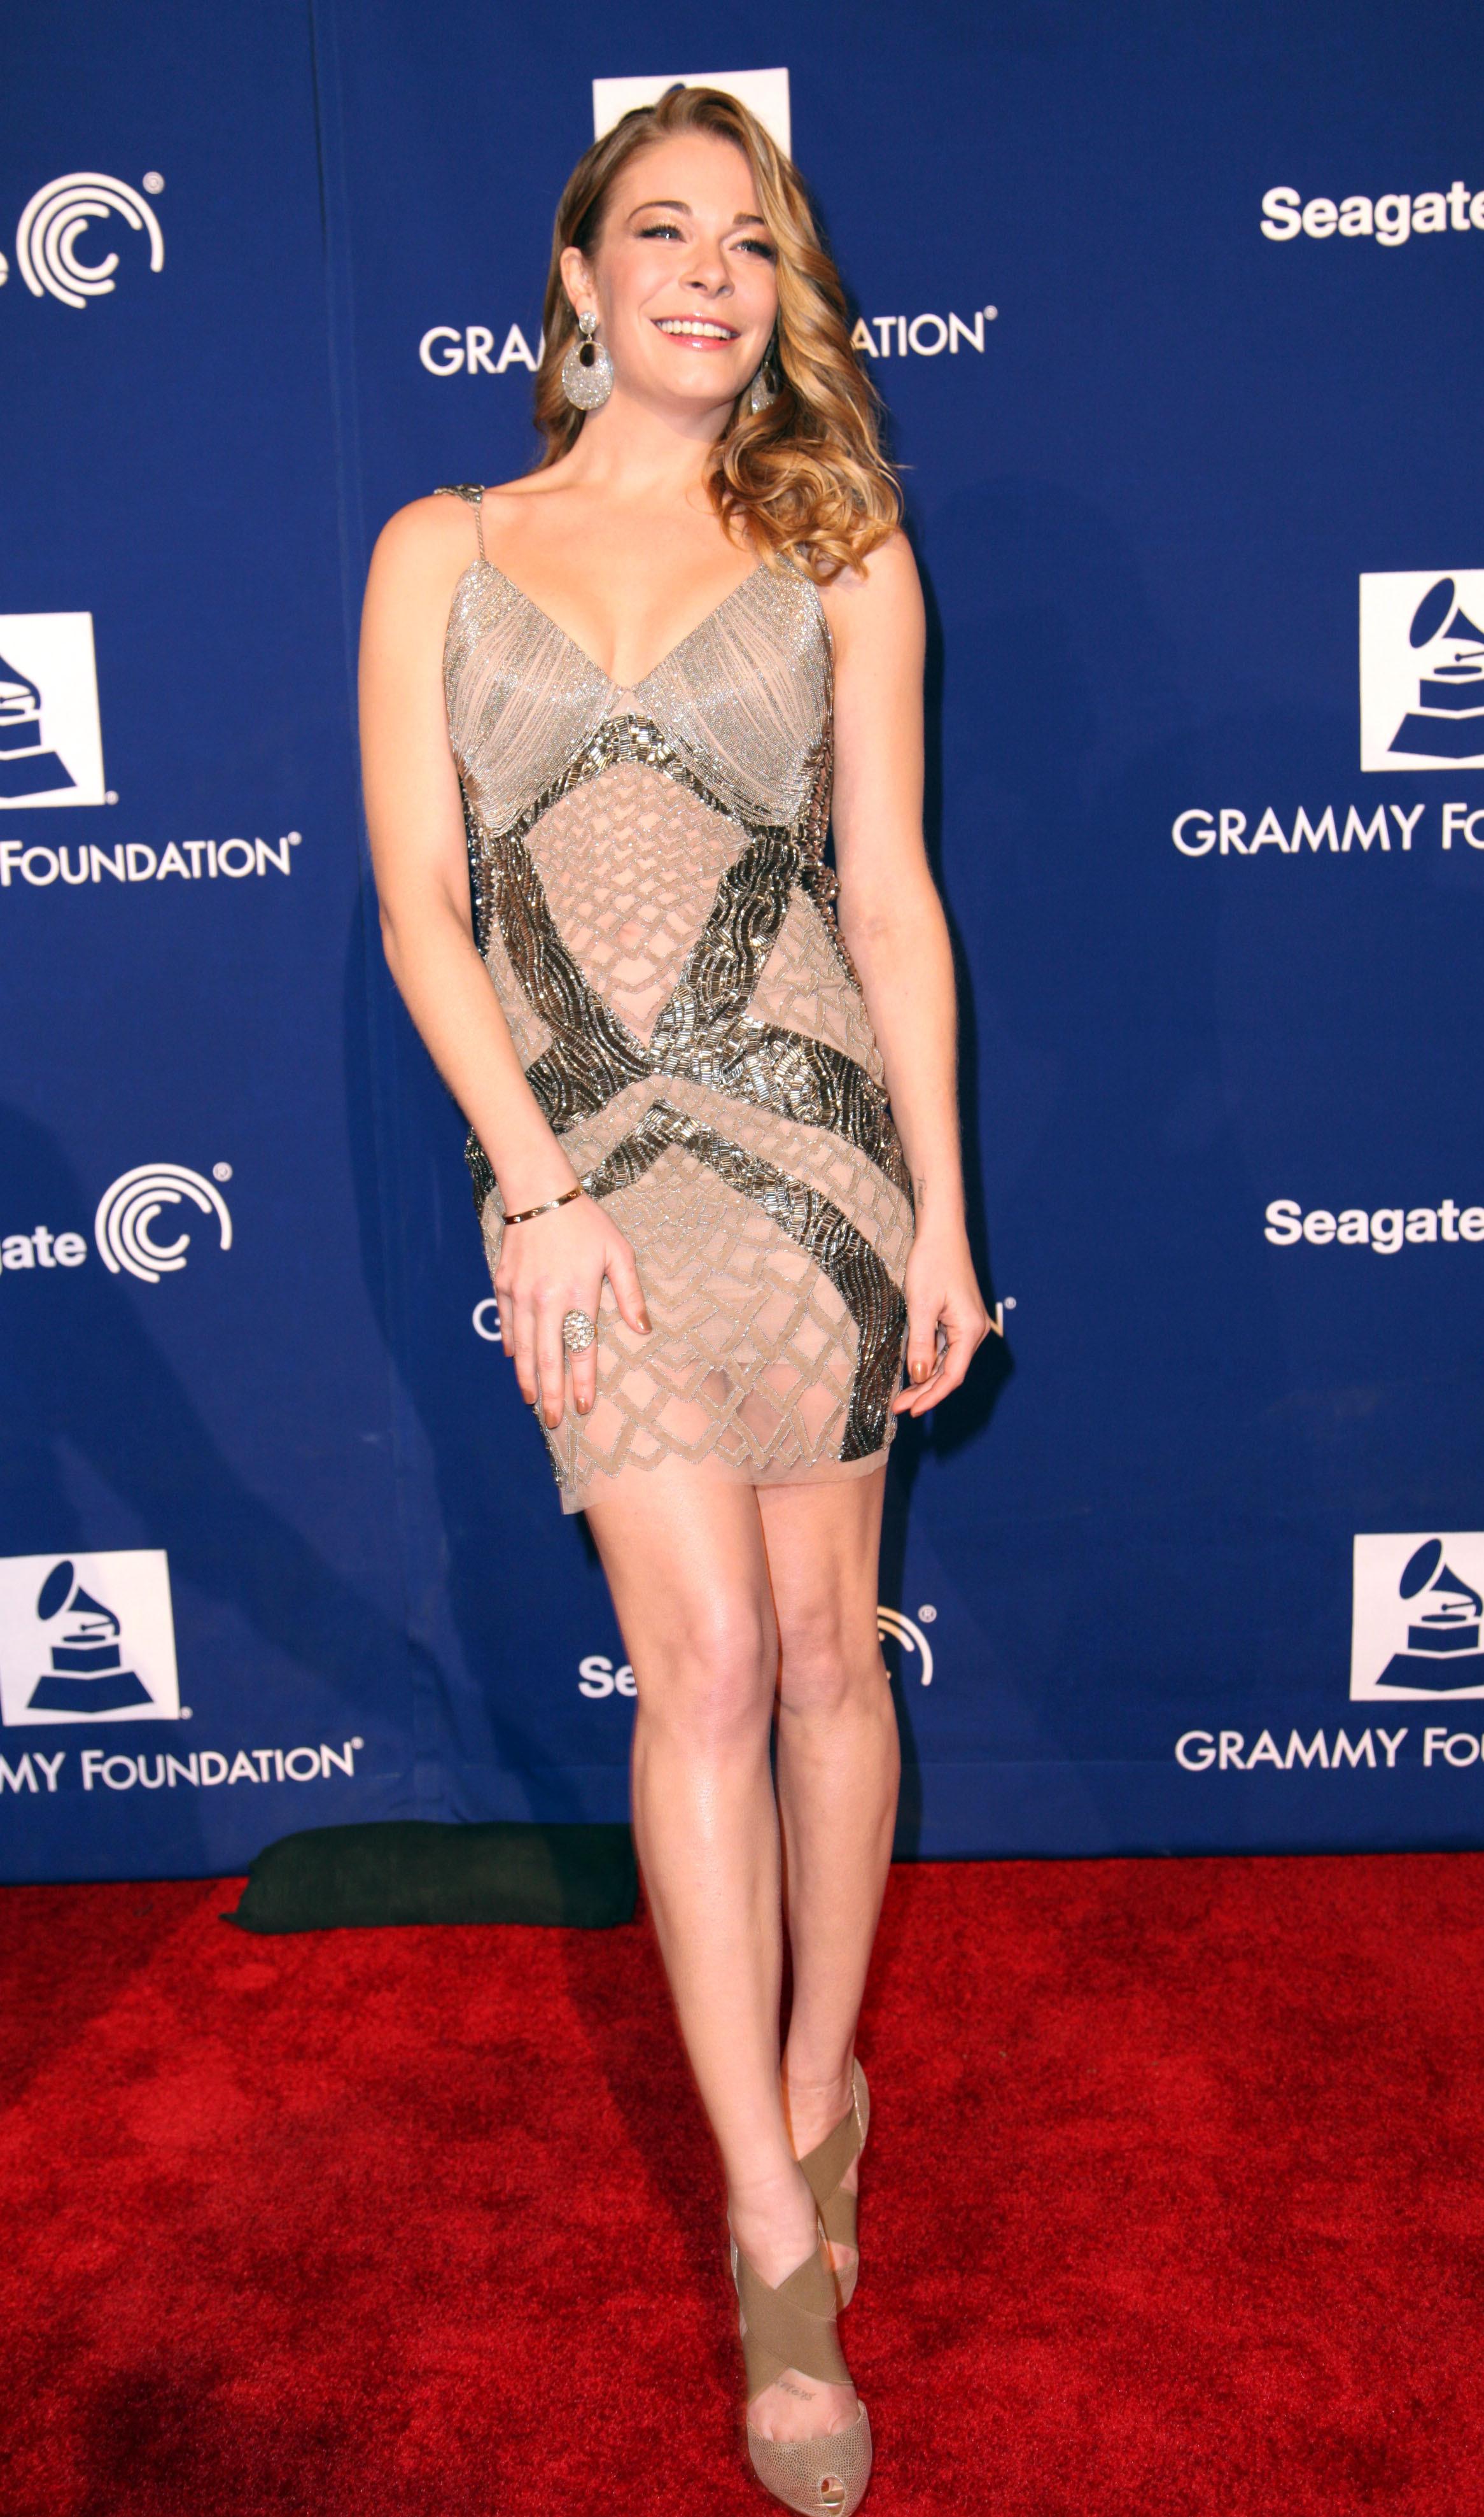 LeAnn Rimes red carpet healthier figure Grammy event